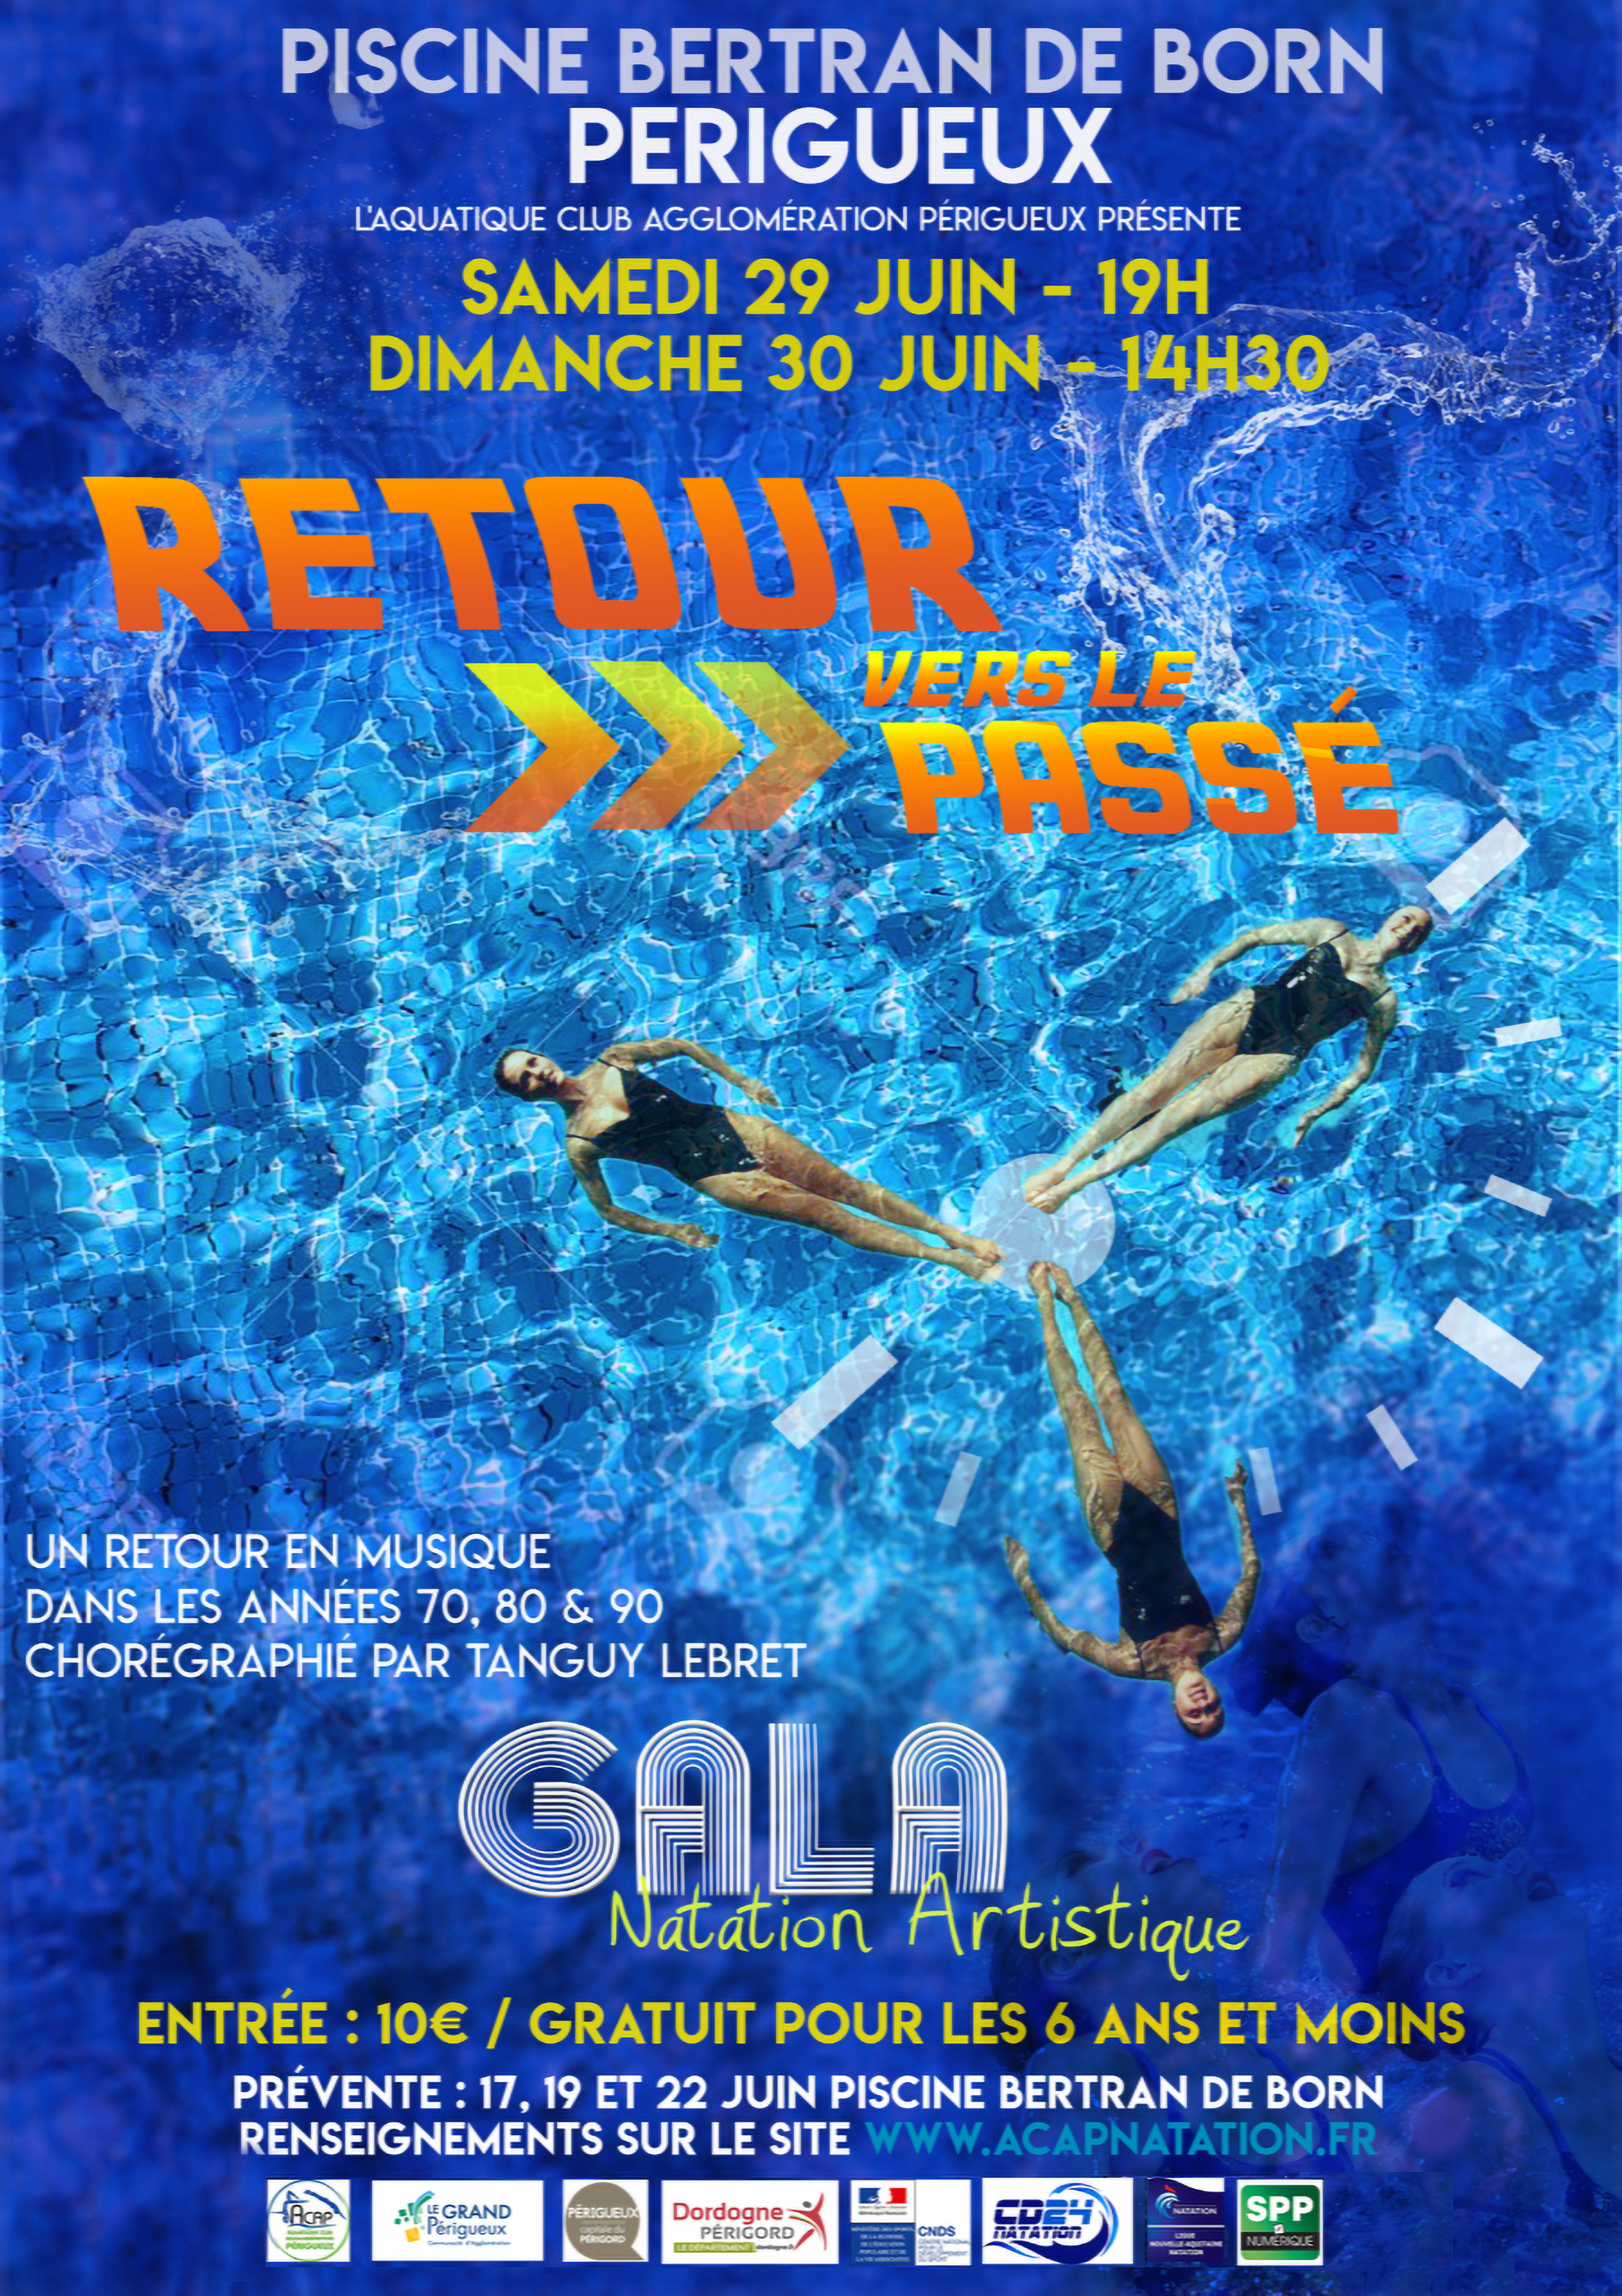 Gala annuel de natation artistique